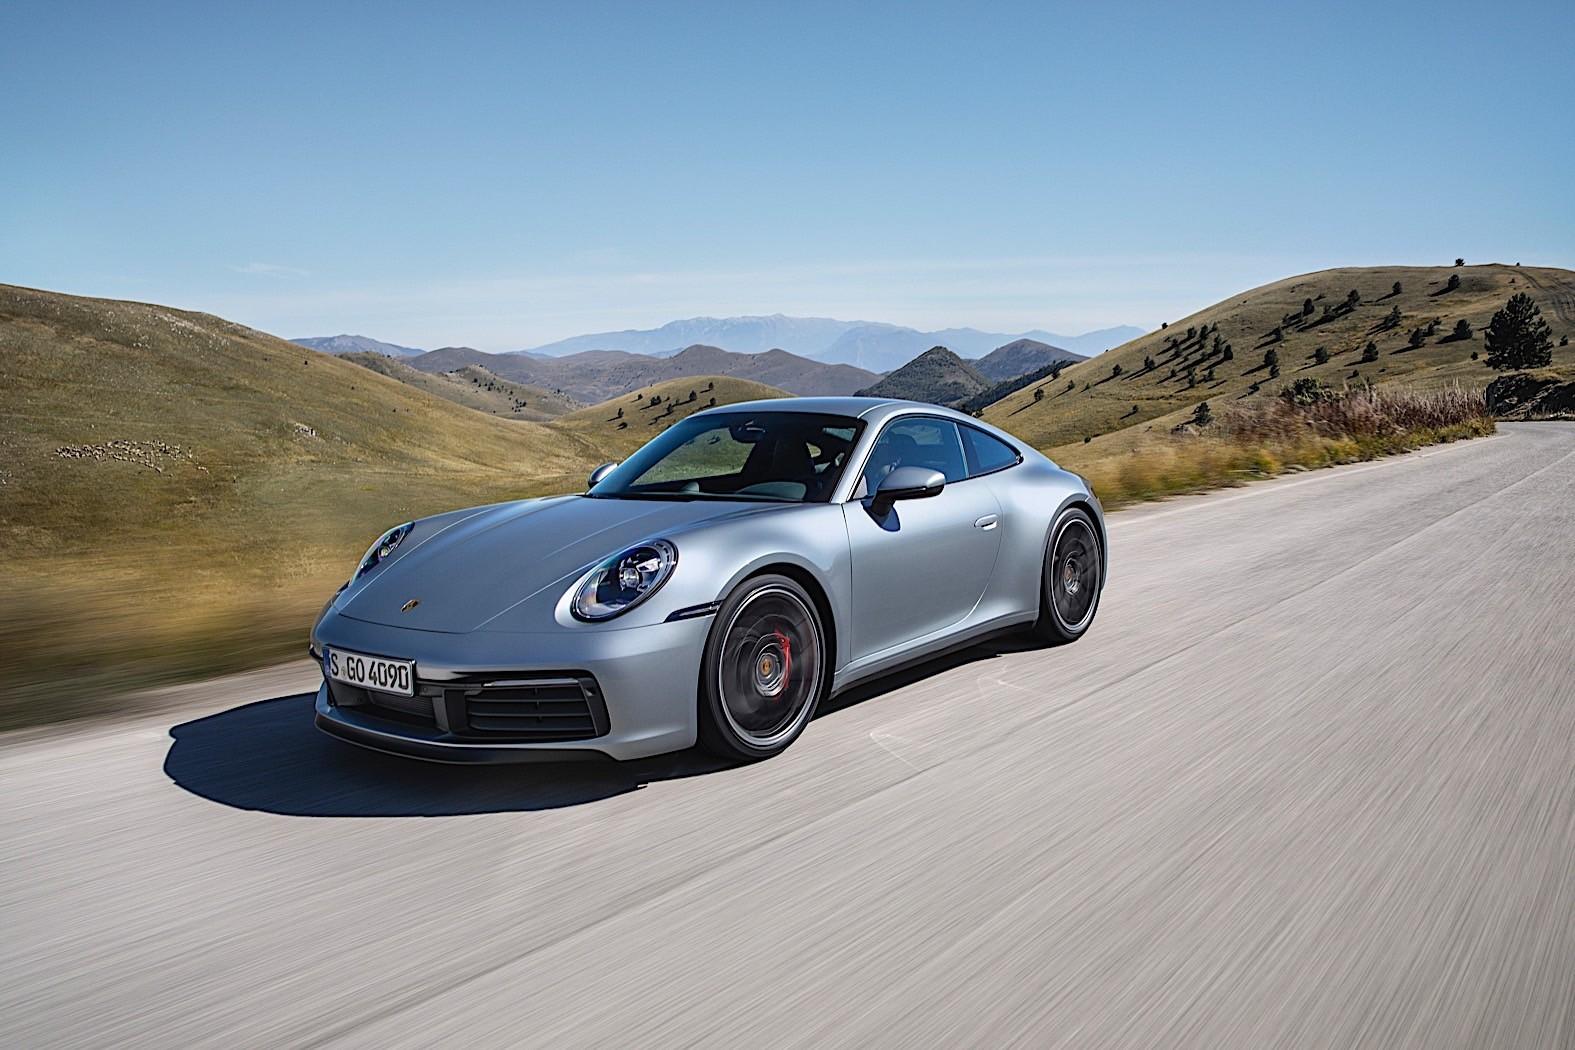 2020 Porsche 911 Carrera S Review - autoevolution